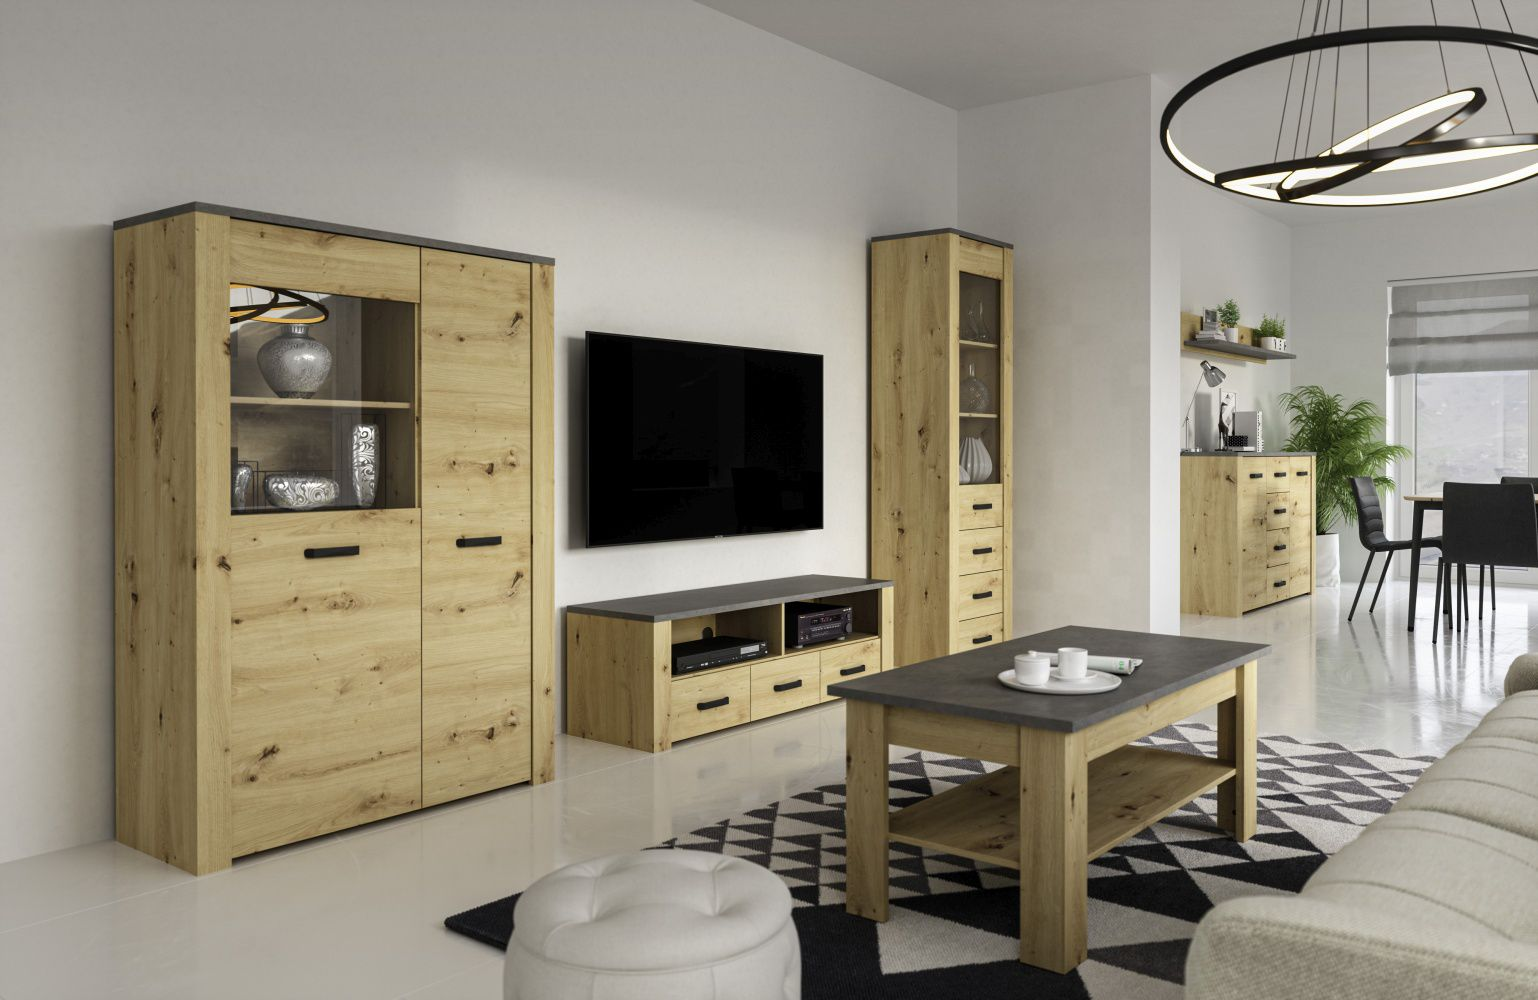 Wohnzimmer Komplett - Set A Talimatau, 5-teilig, Farbe: Eiche / Grau